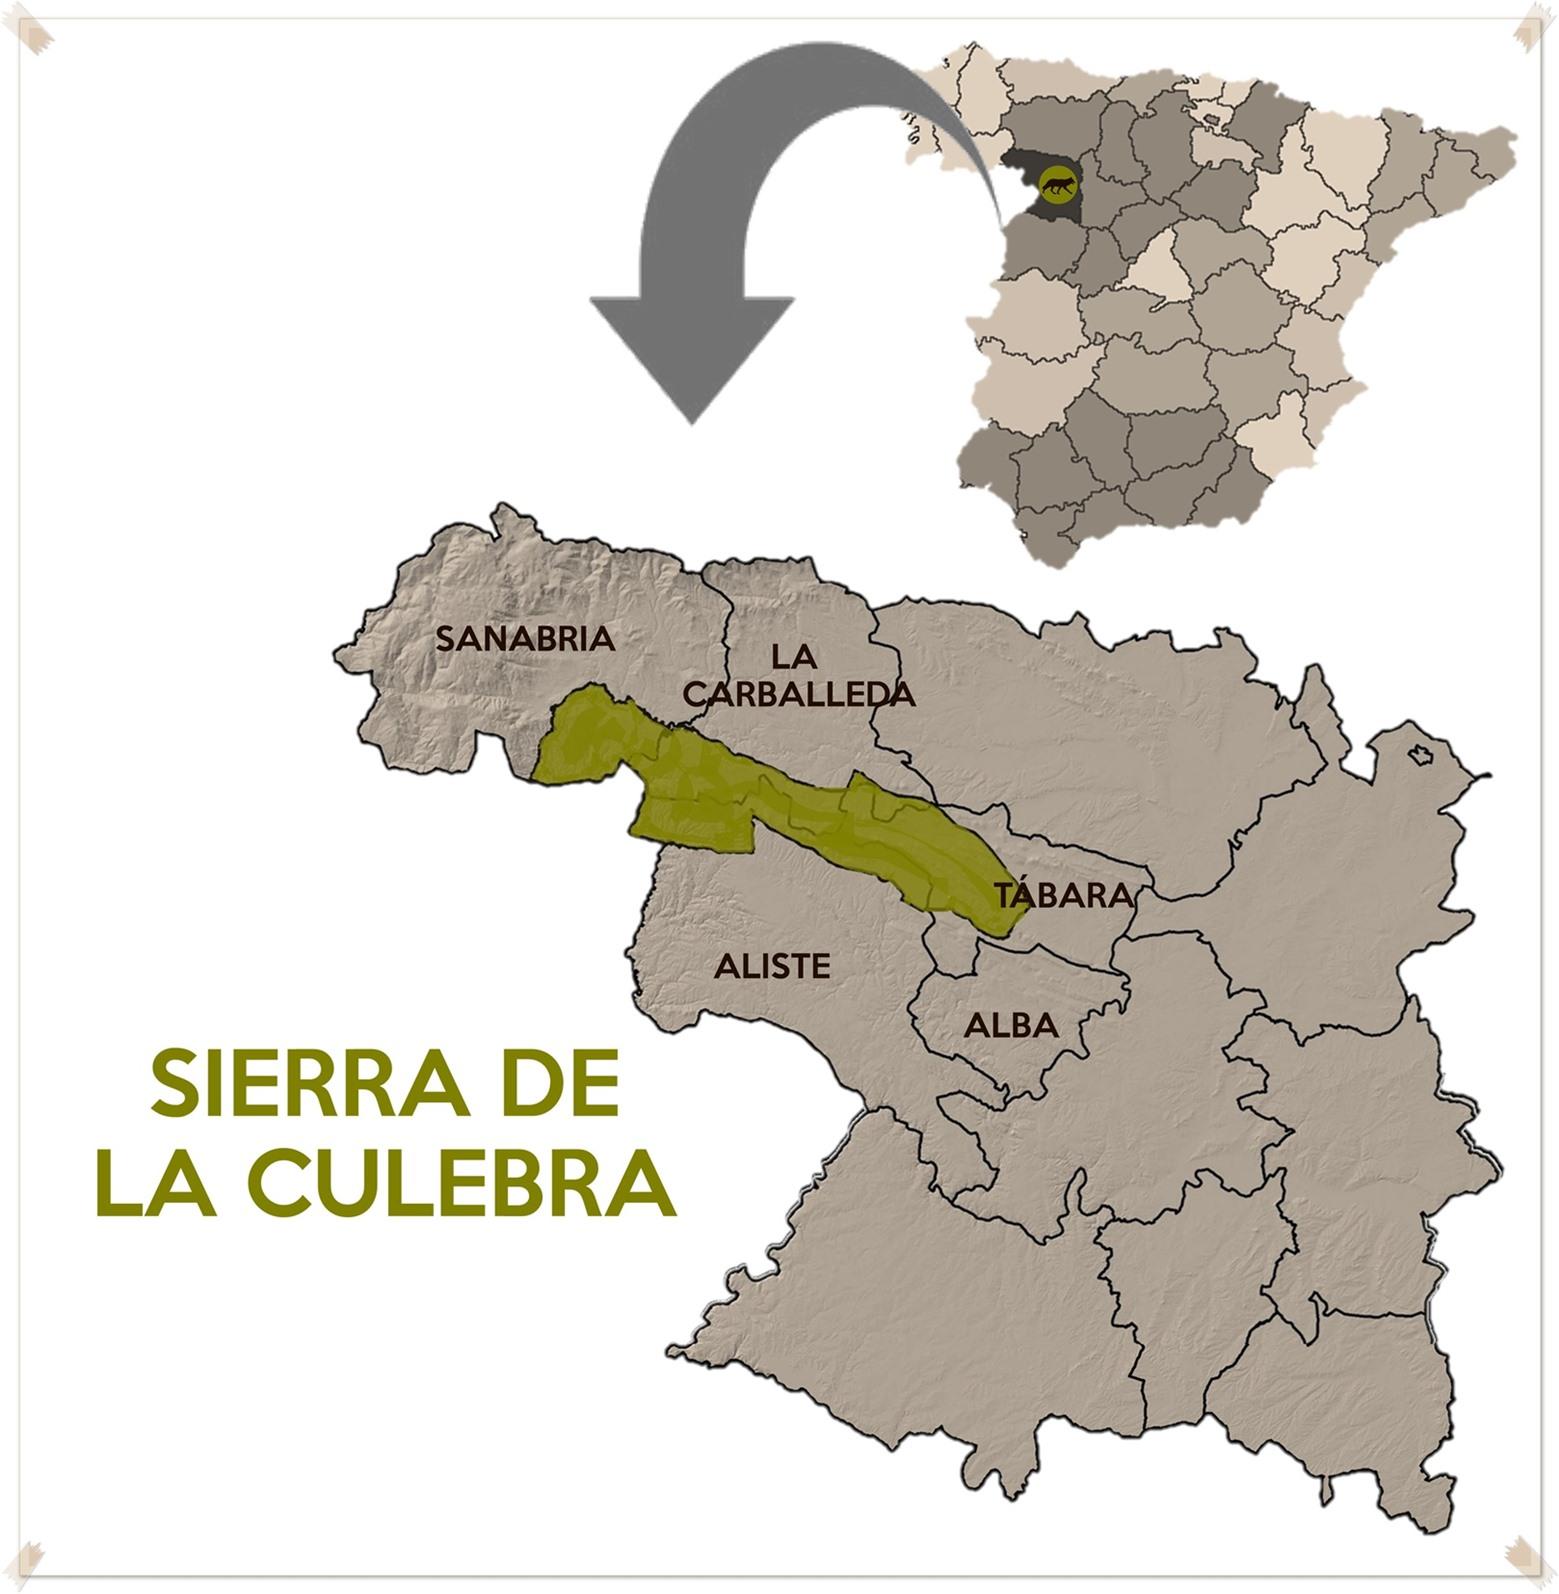 Llobu Observacion De Lobo Iberico En La Sierra De La Culebra